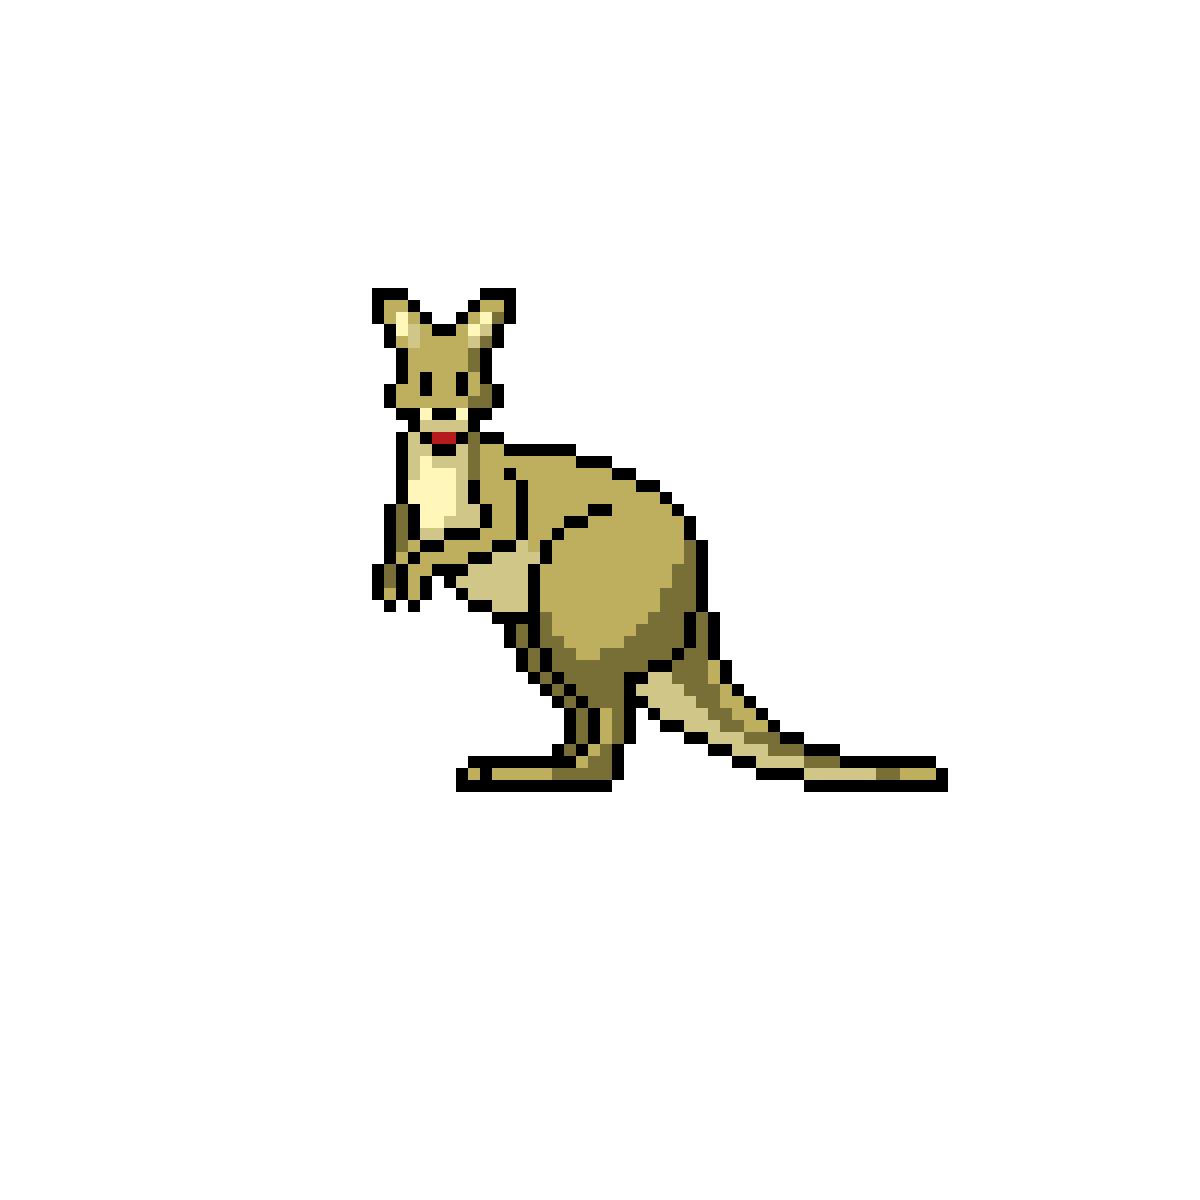 kangaroo by mcdonough